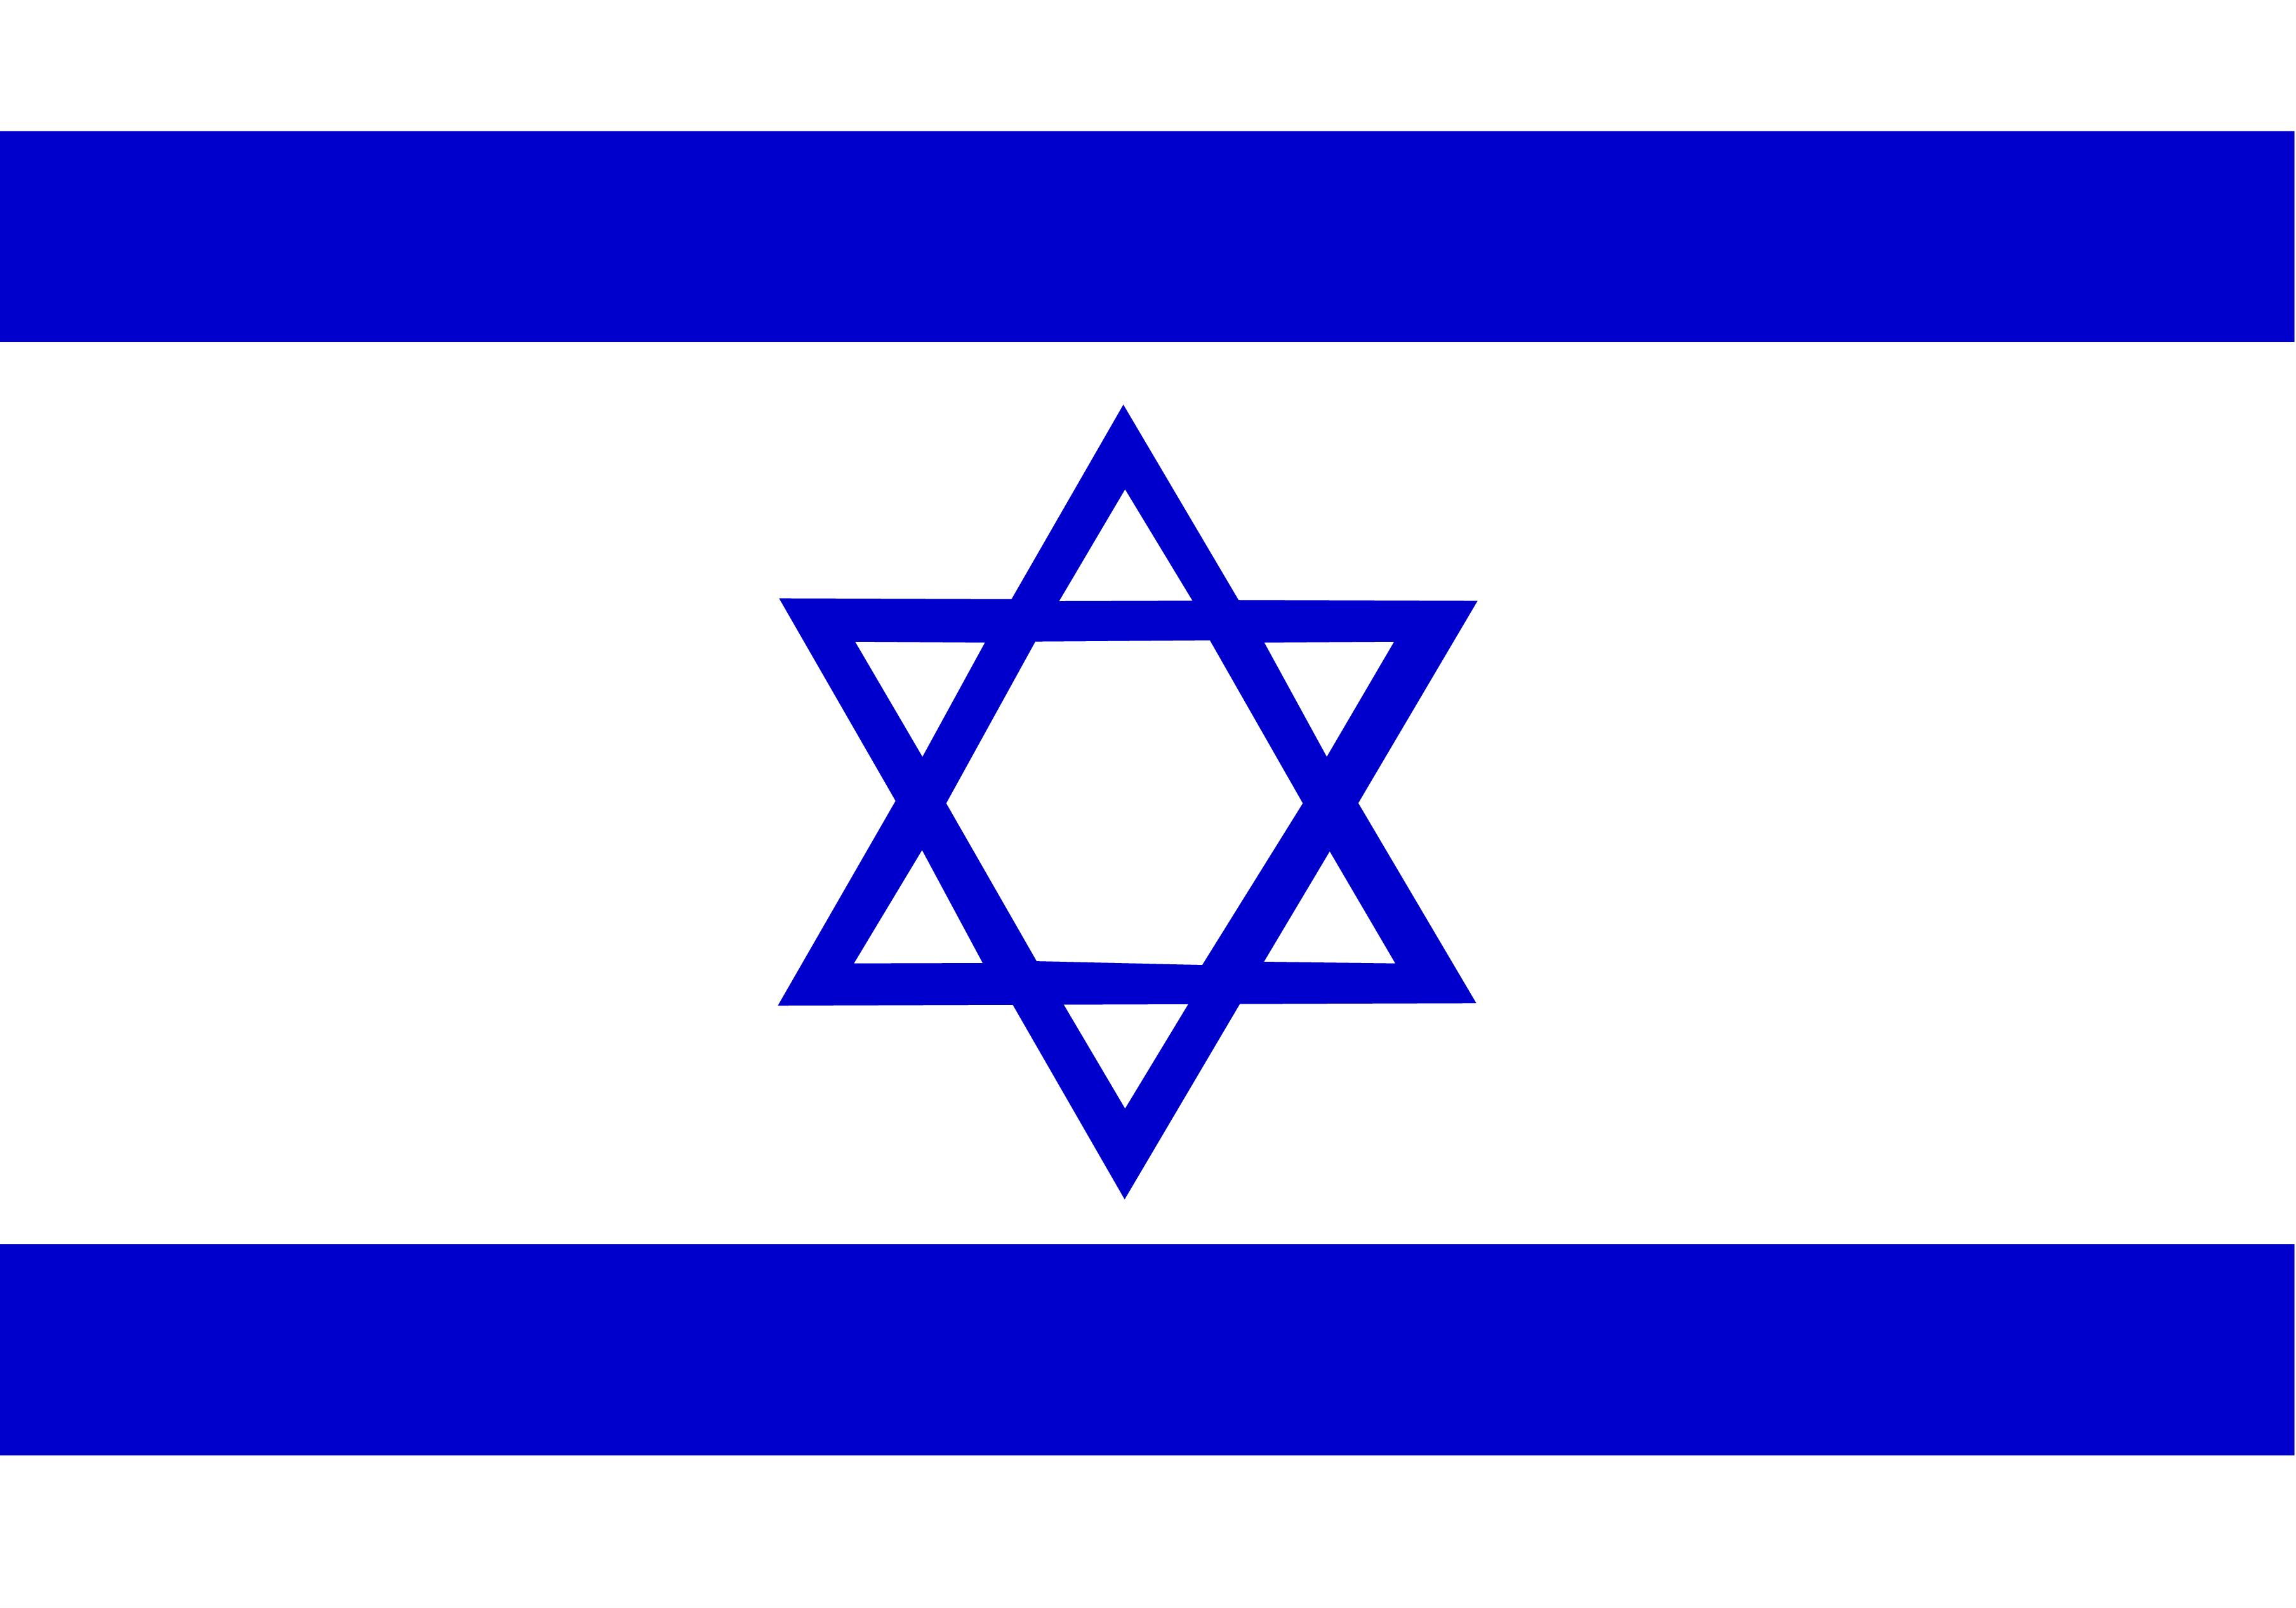 Israel Flag | Free Images at Clker.com - vector clip art online ...